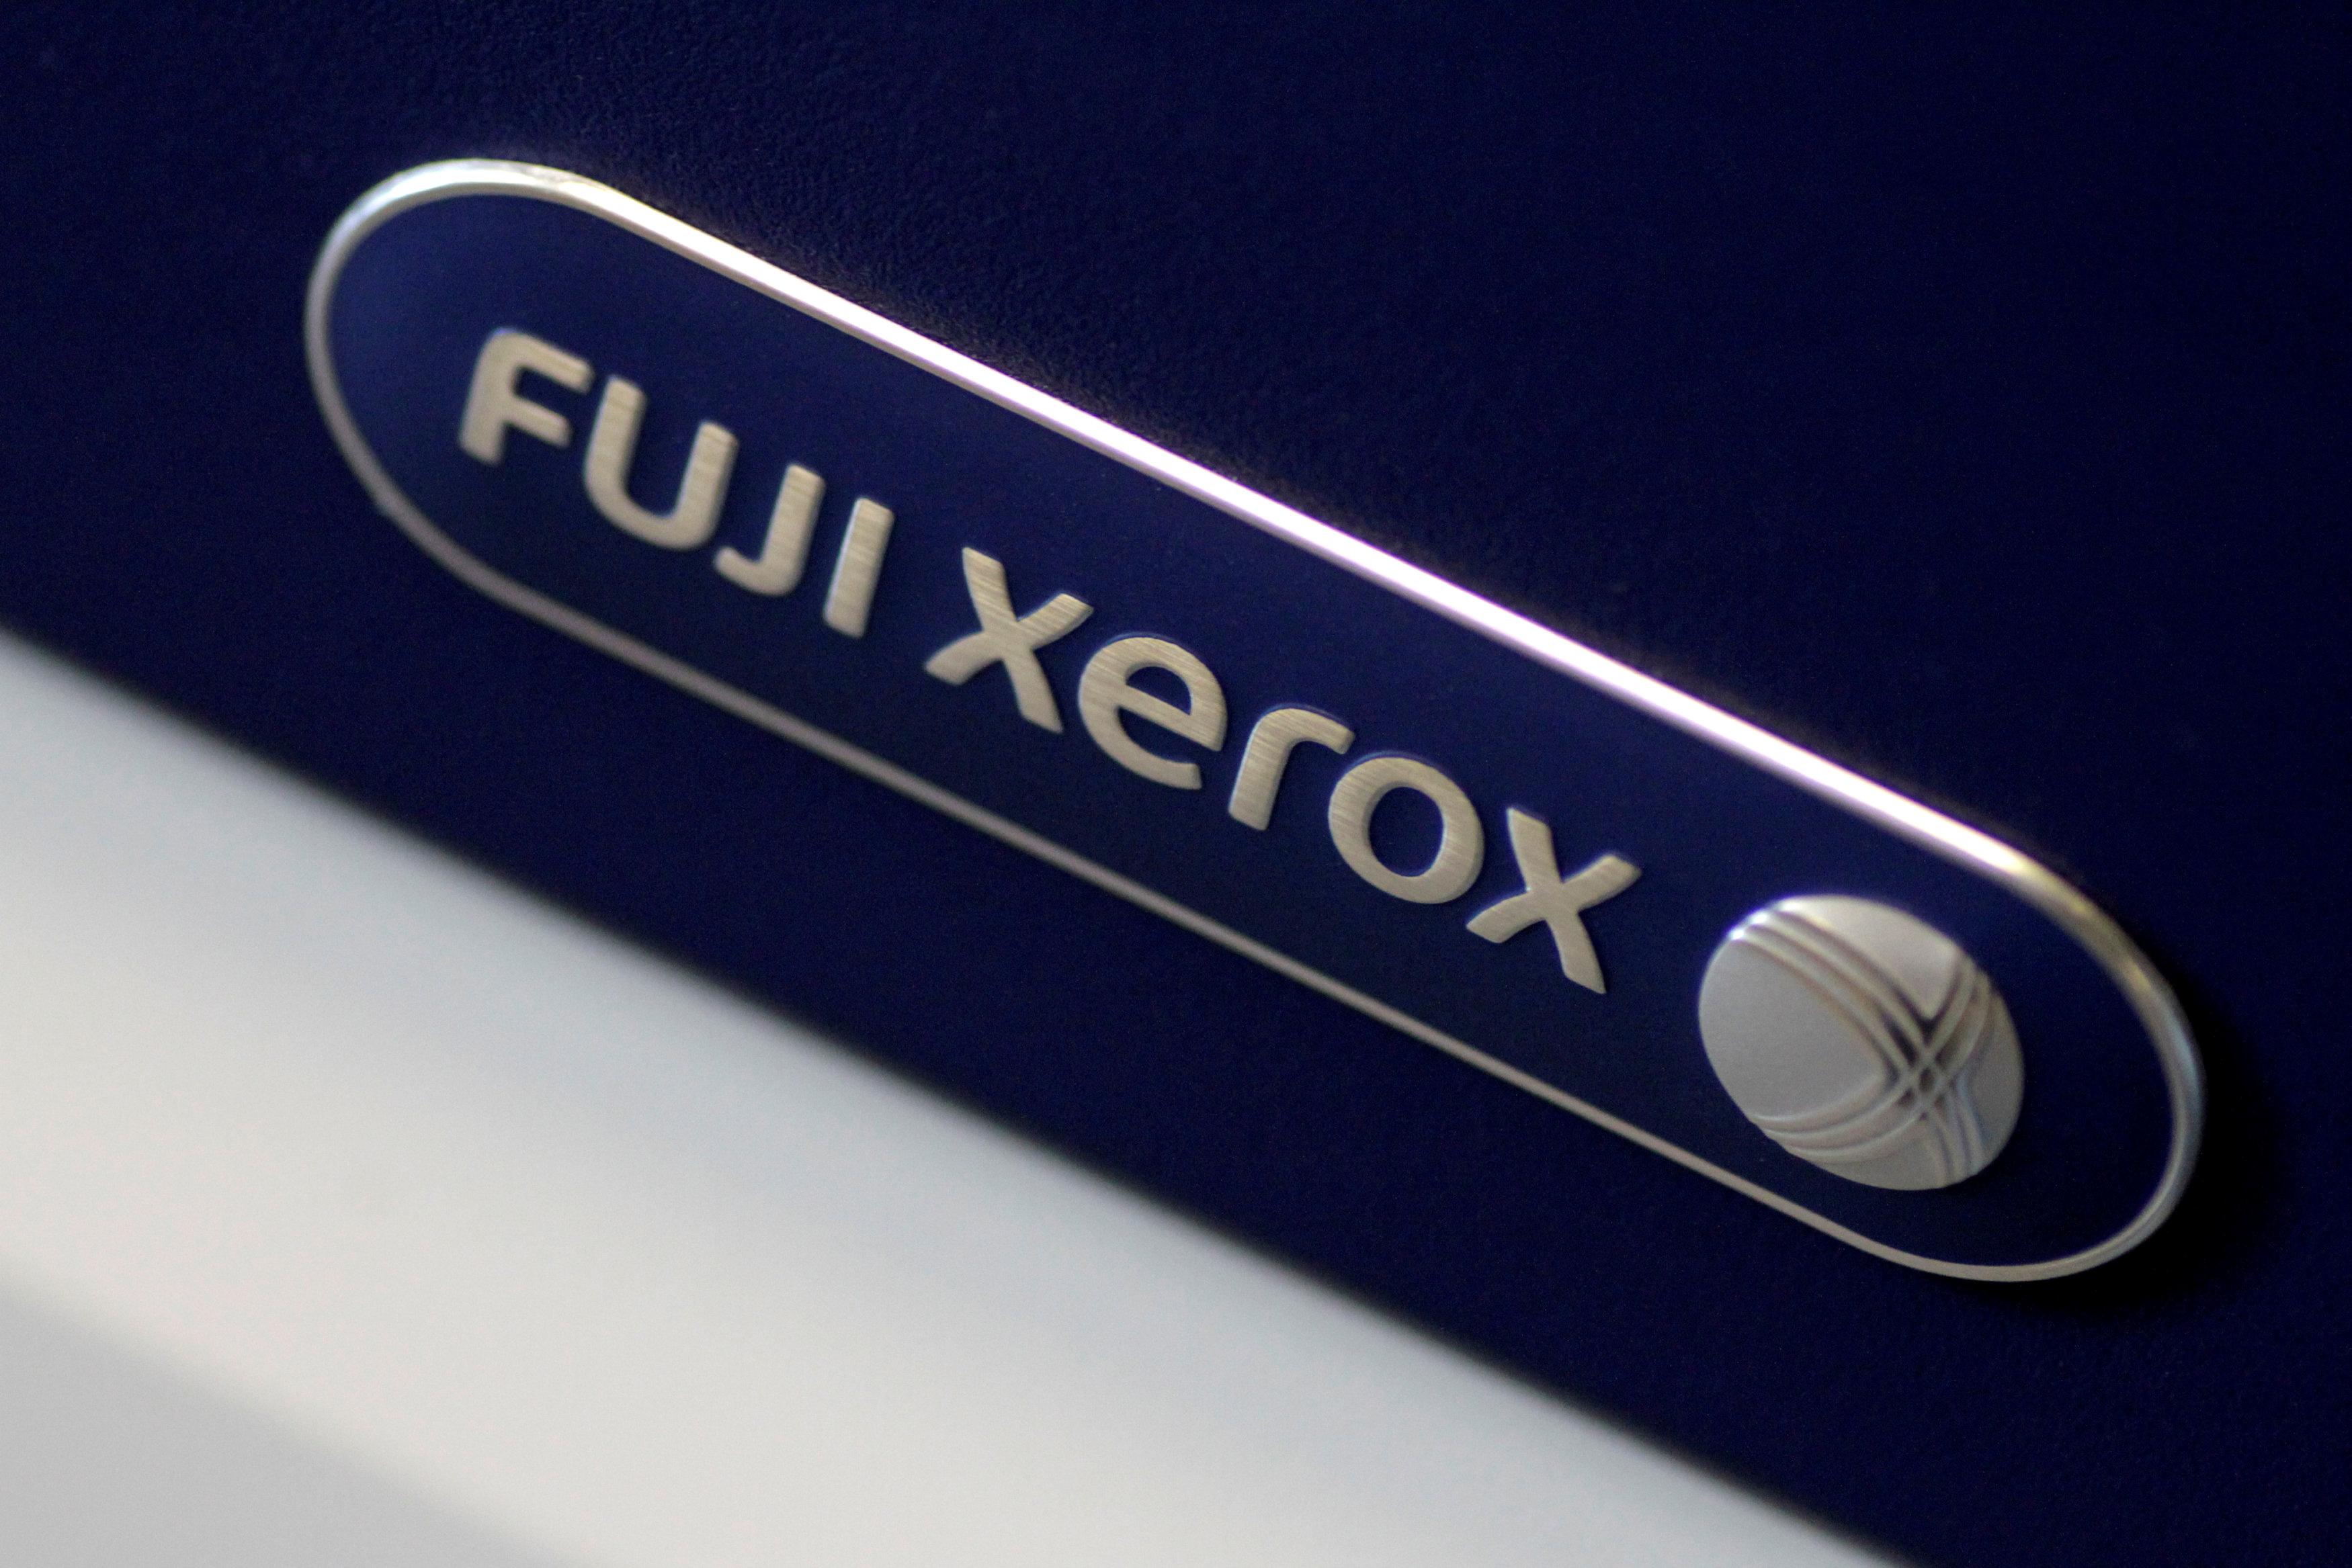 FILE PHOTO: Illustration photo of the Fuji Xerox logo